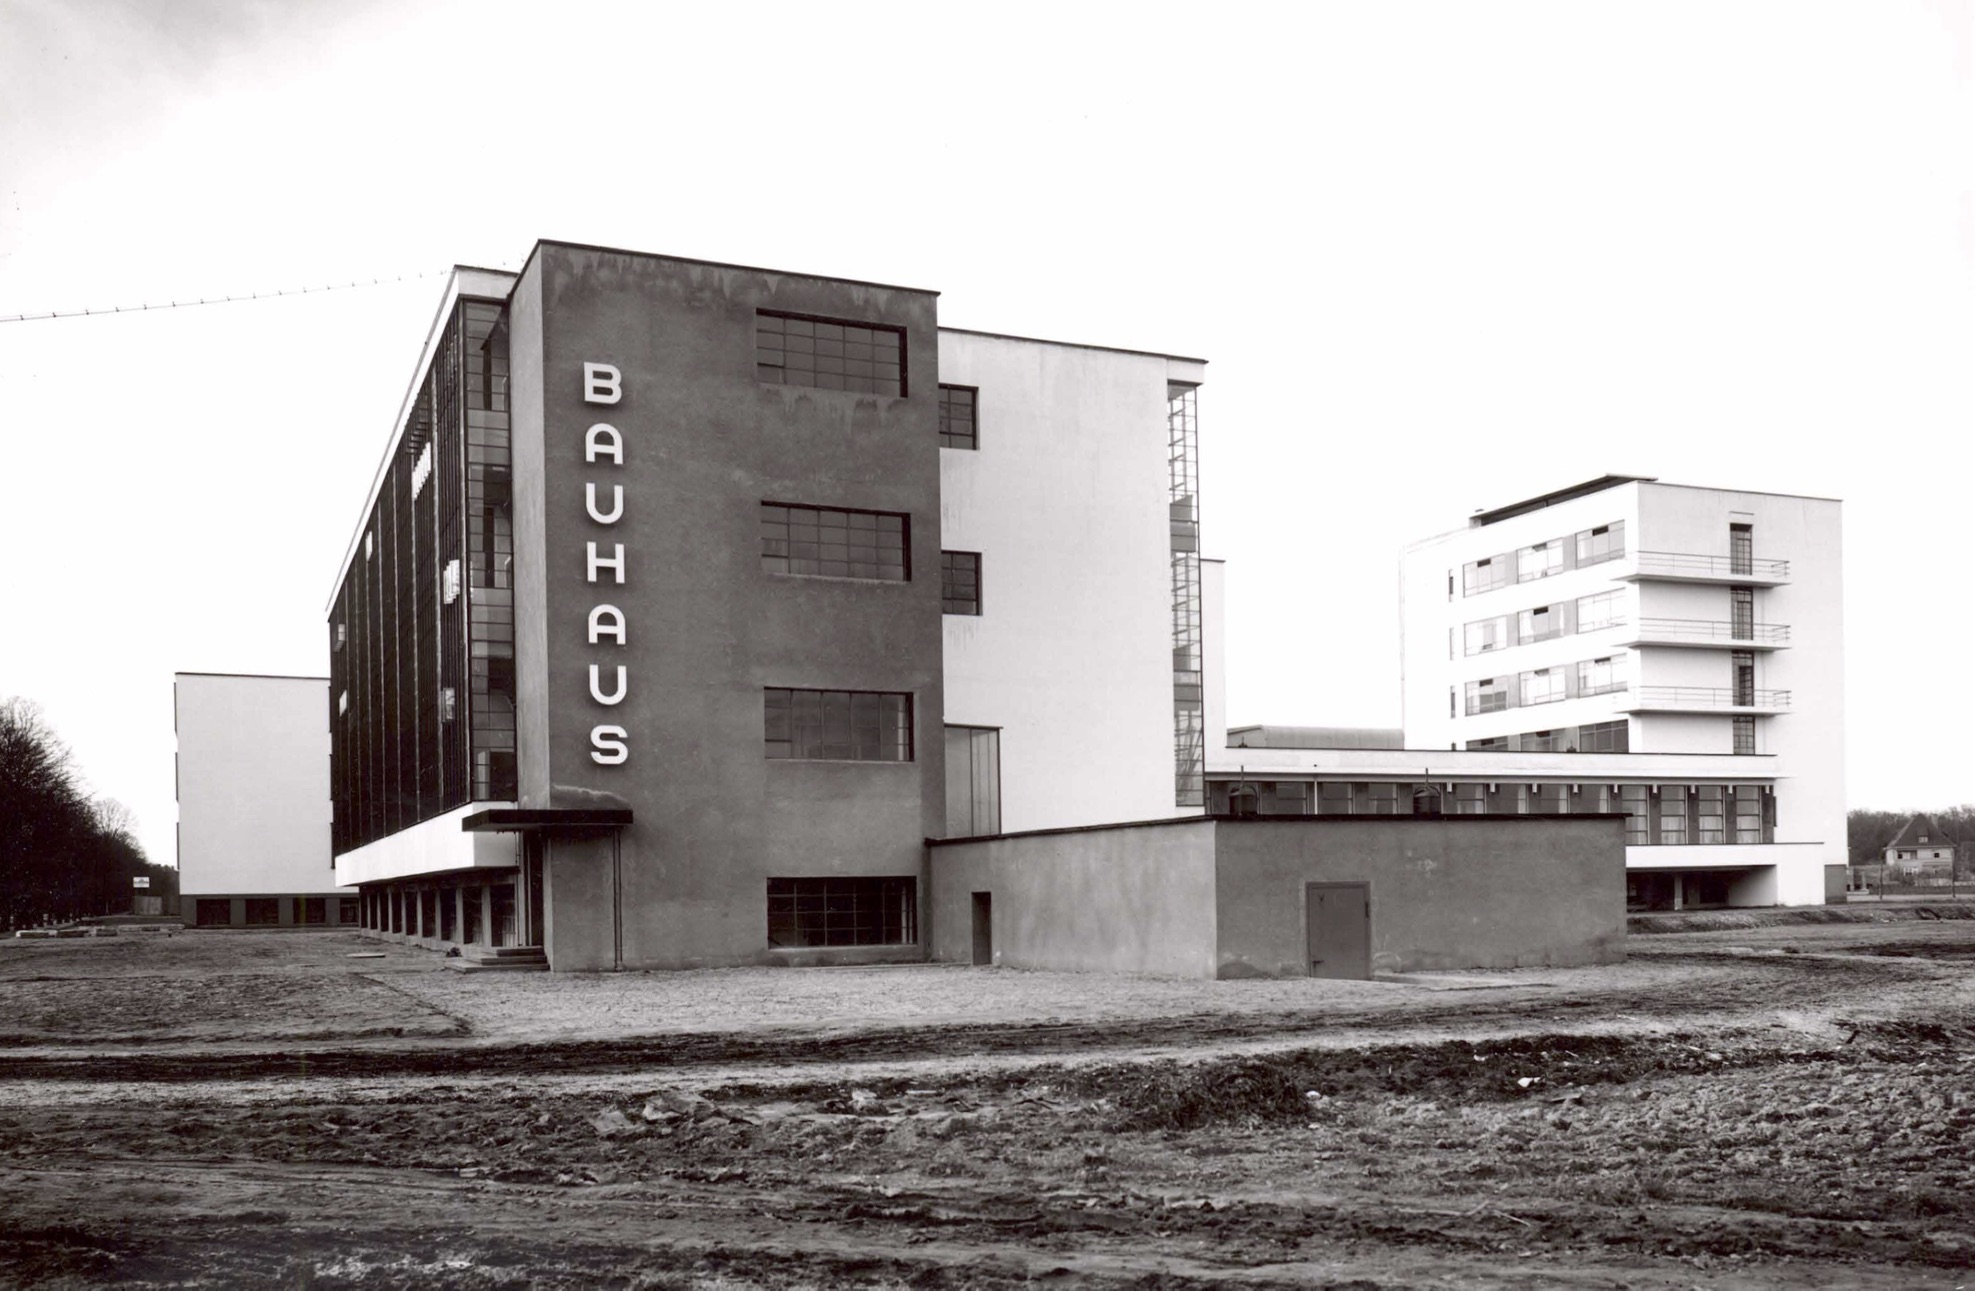 MoholyBauhaus